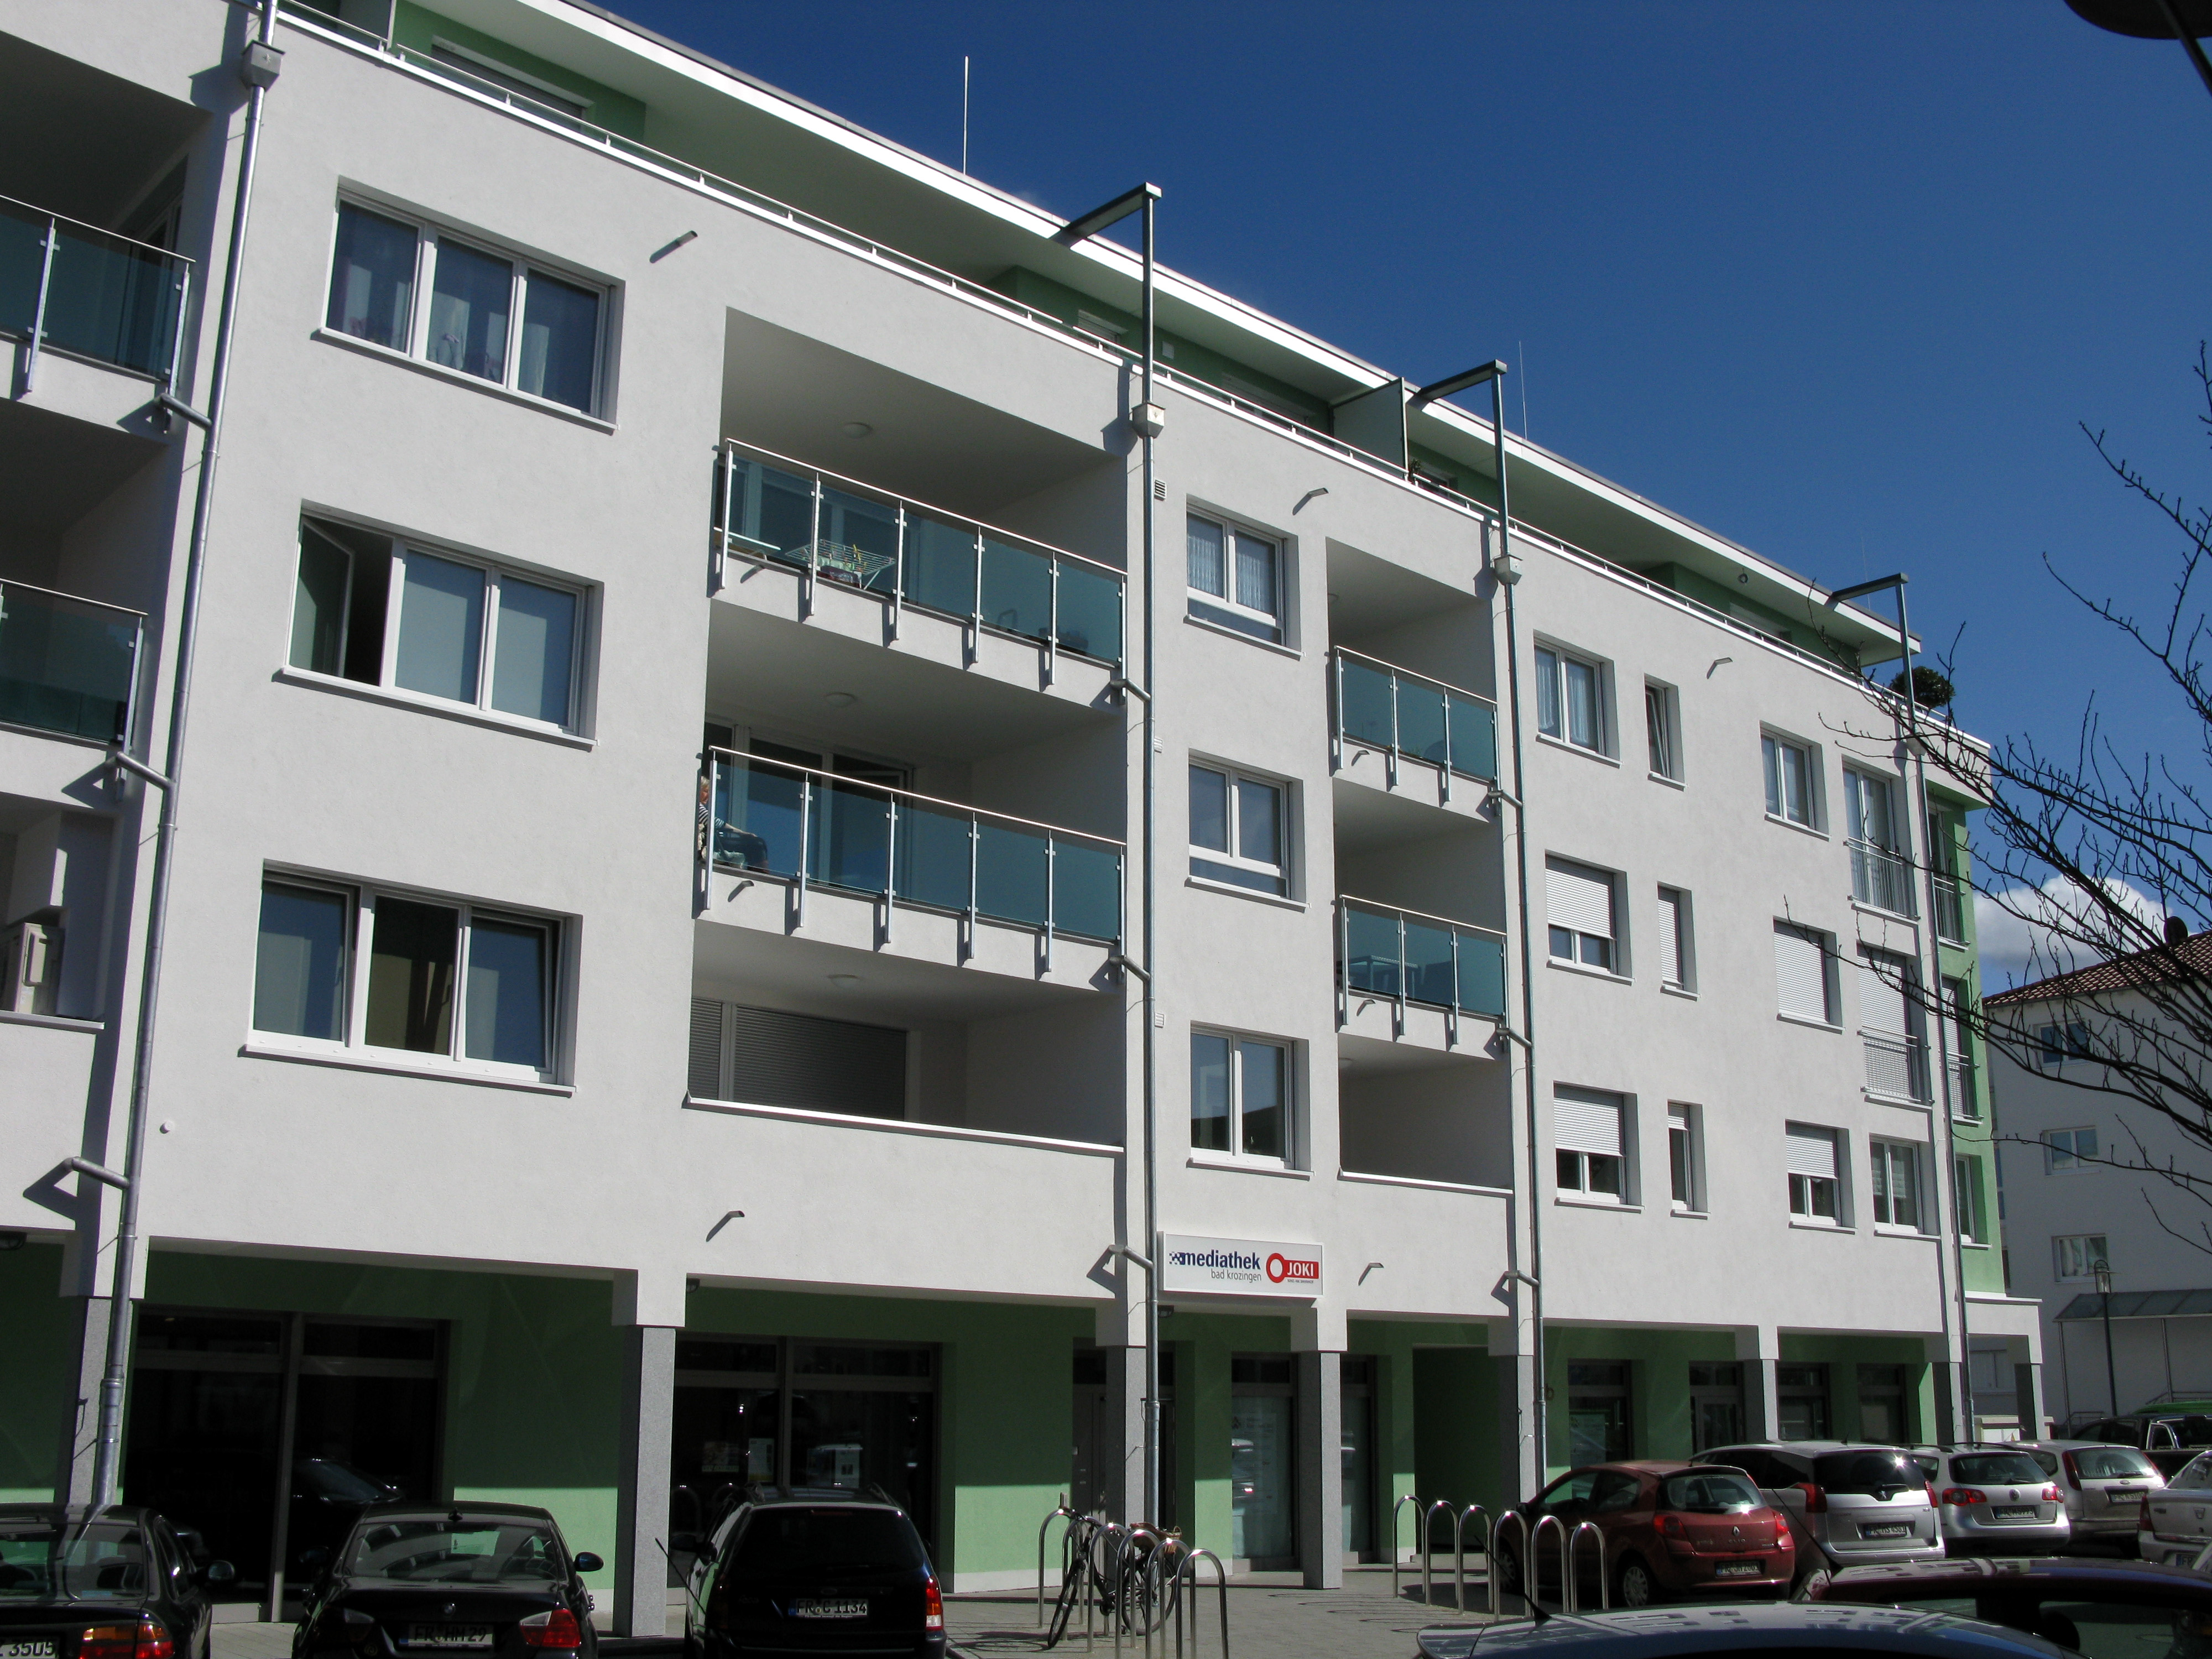 File:Mediathek Bad Krozingen.jpg - Wikimedia Commons